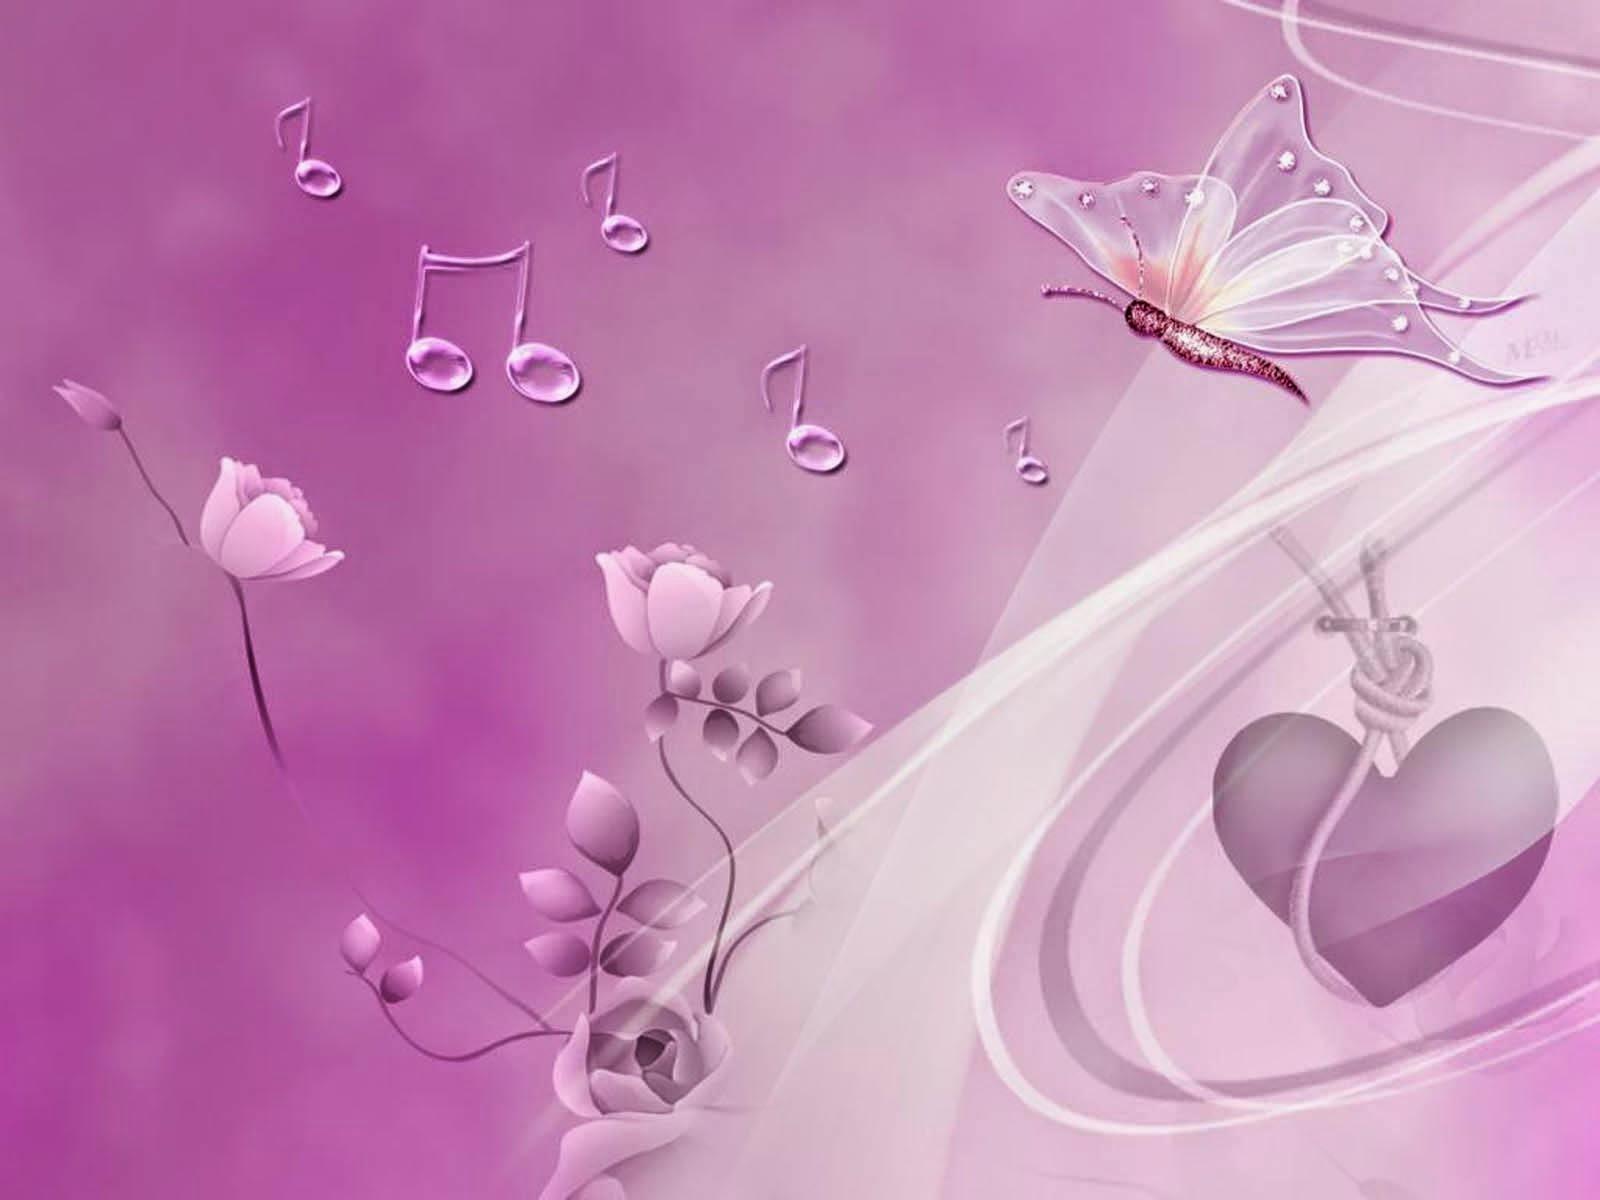 Download image 3d Butterflies Desktop Backgrounds PC, Android, iPhone ...